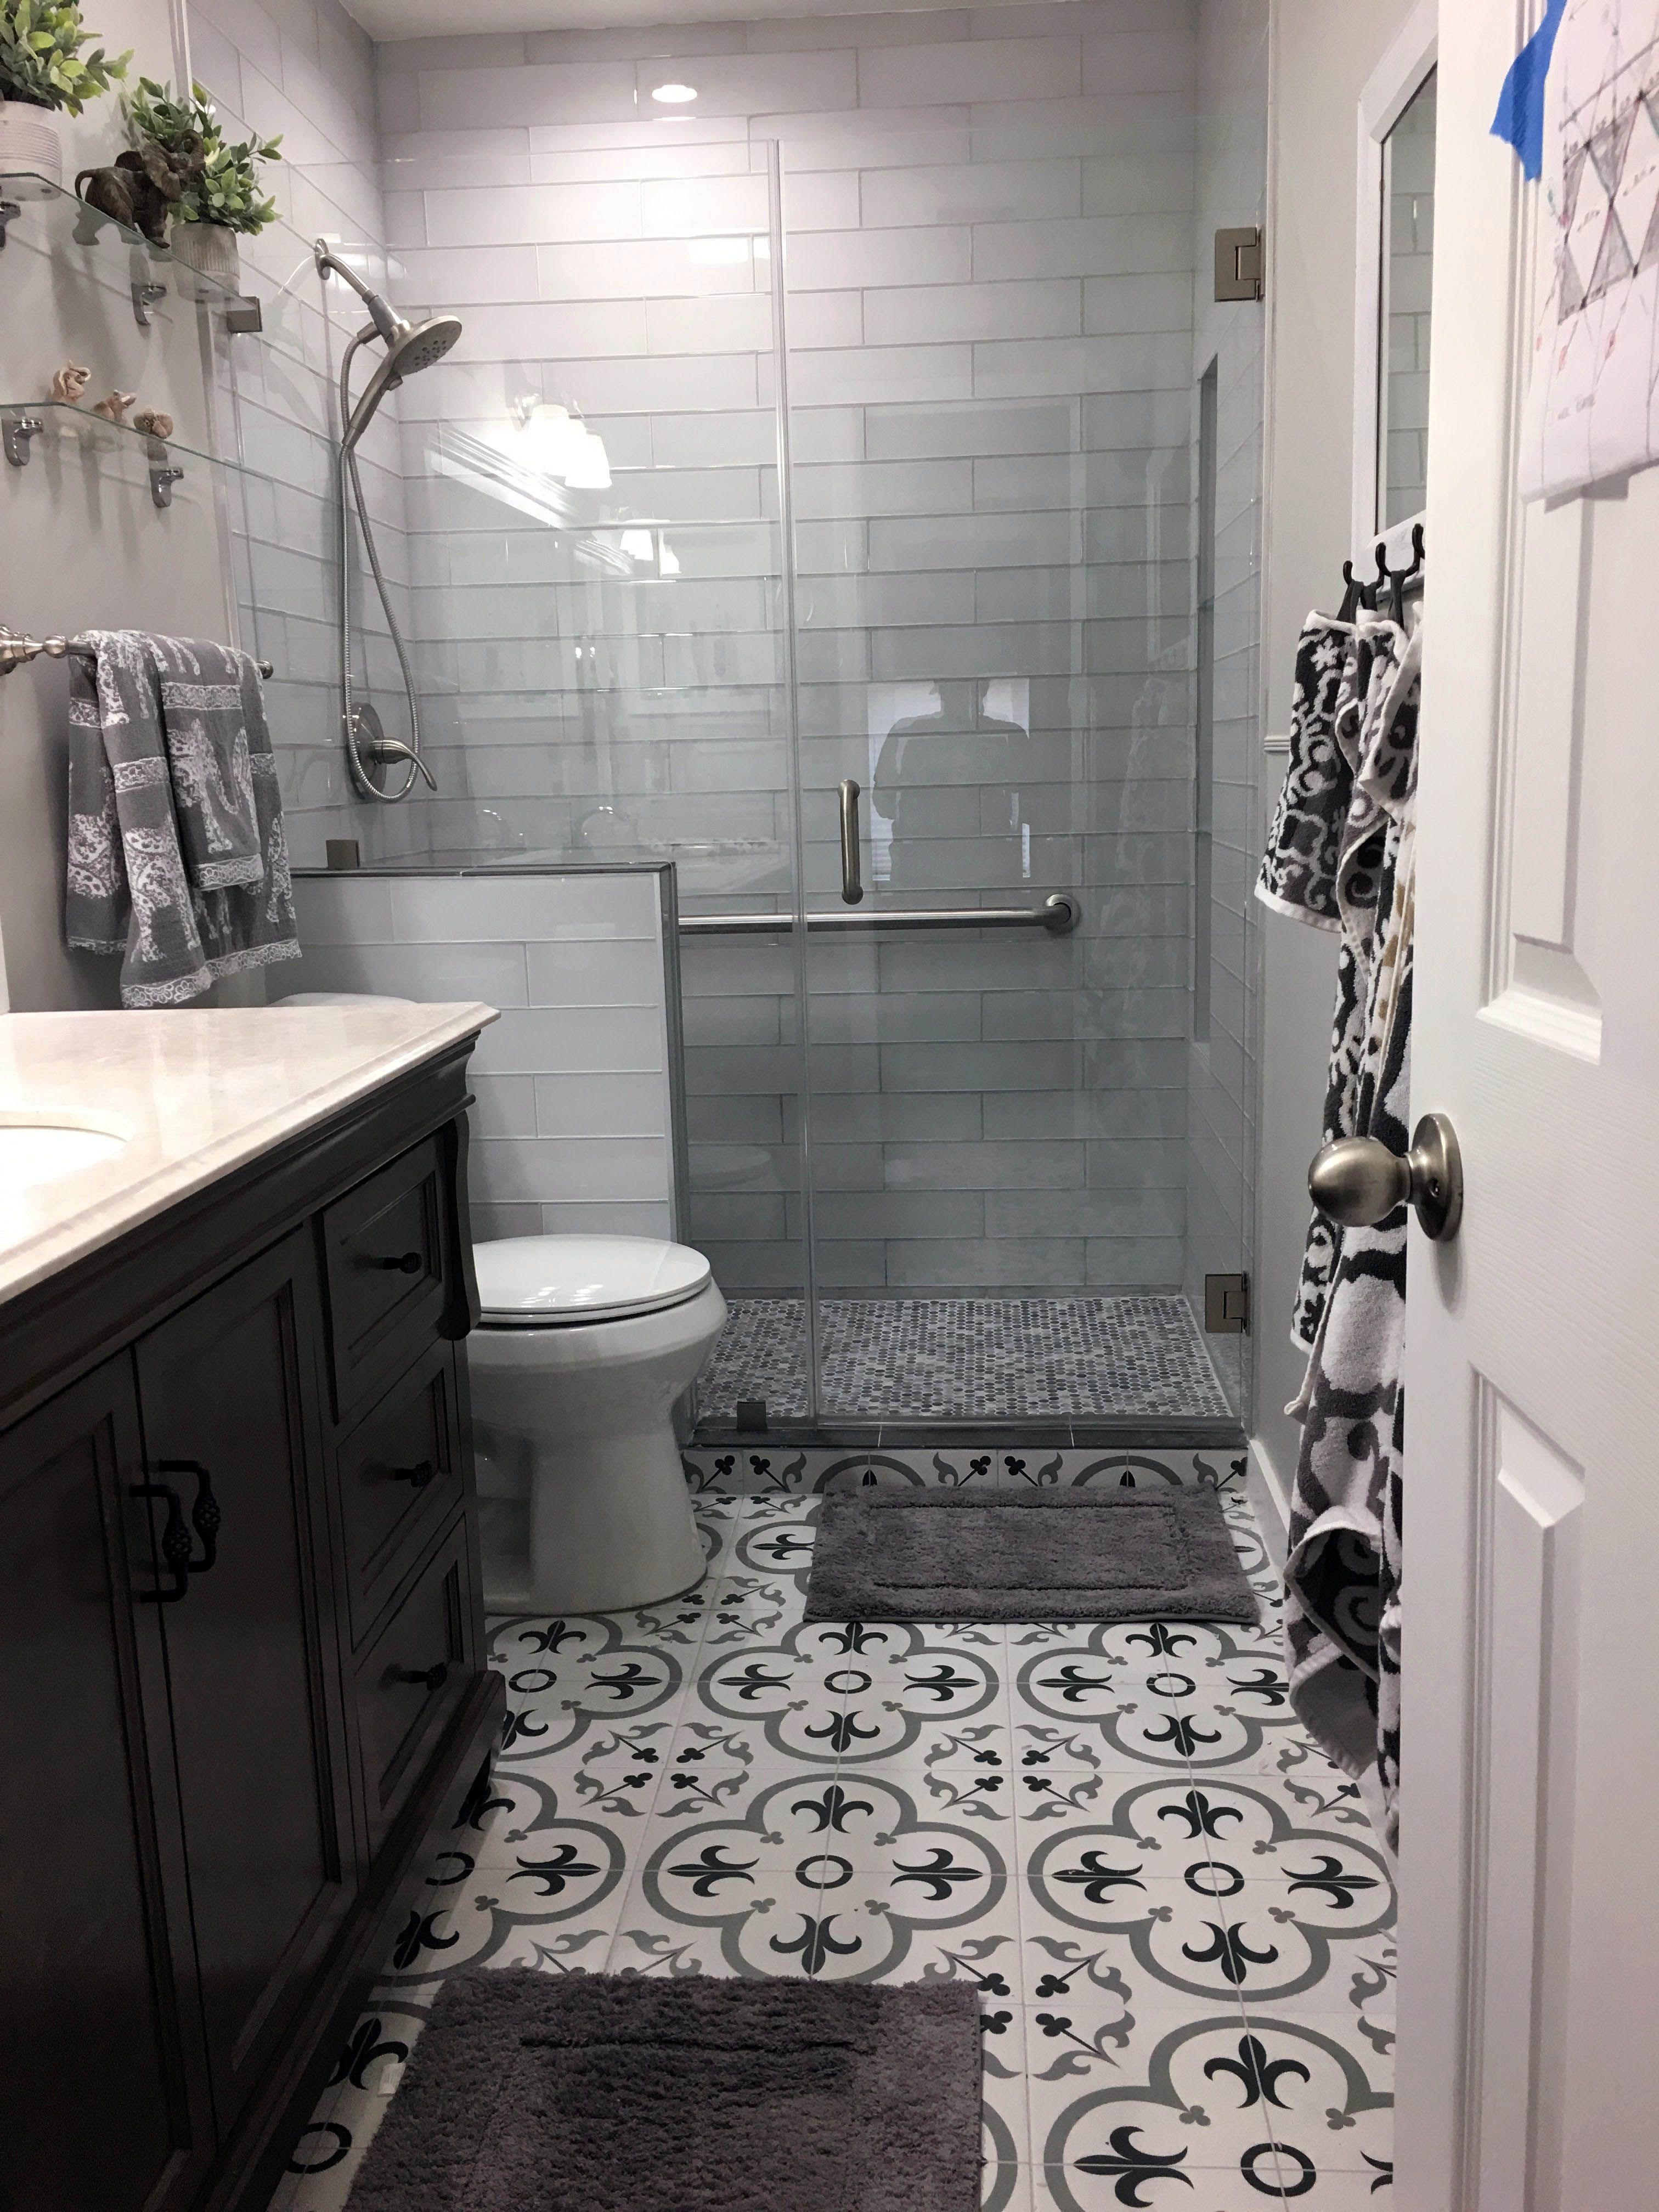 Crazy Shower Tile Placement Ideas To Refresh Your Home Diy Bathroom Remodel Bathroom Floor Tiles Bathroom Remodel Shower